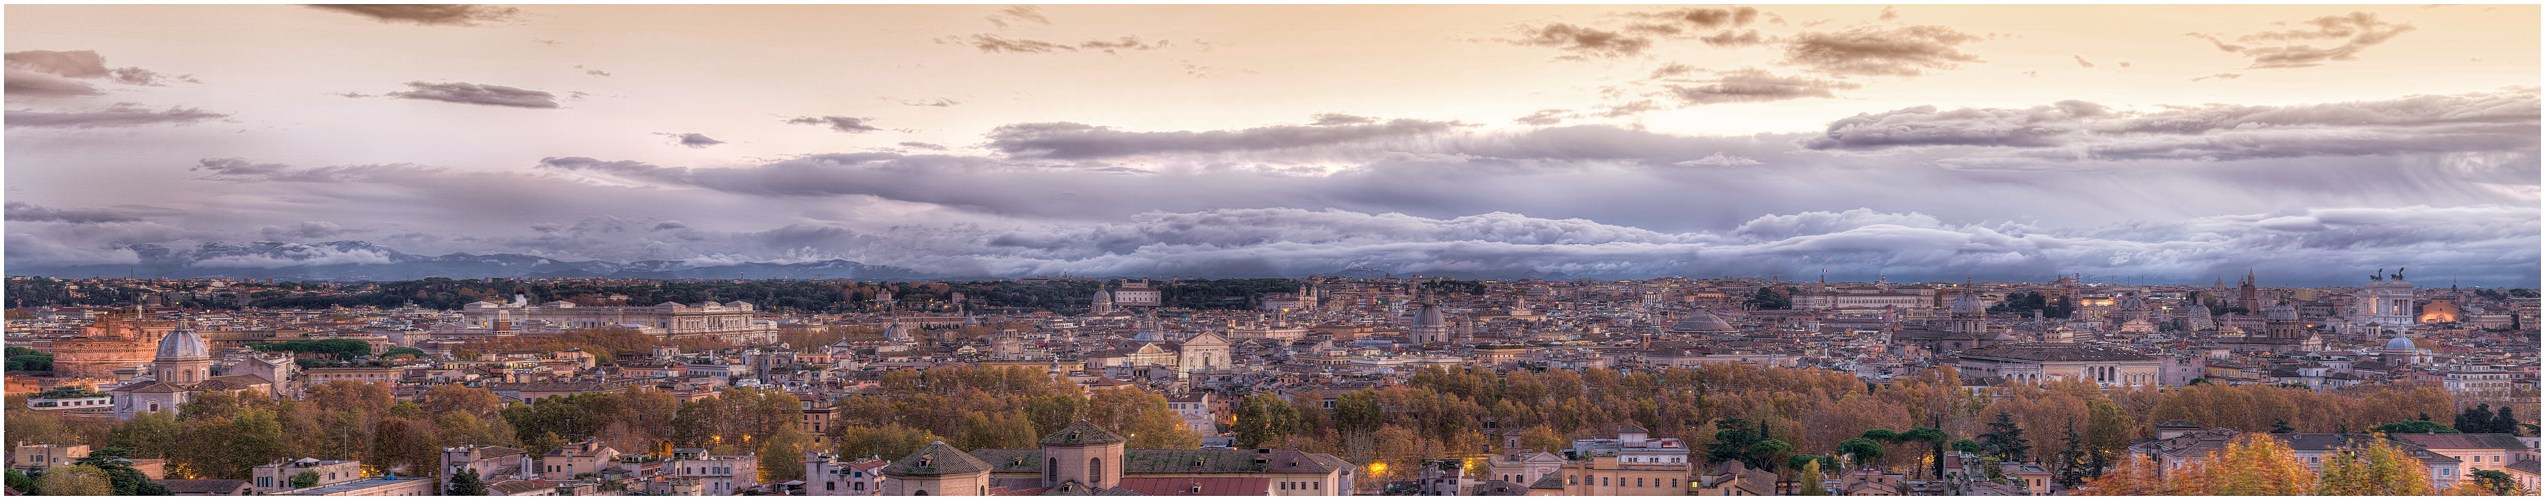 Gianicolo - Panorama